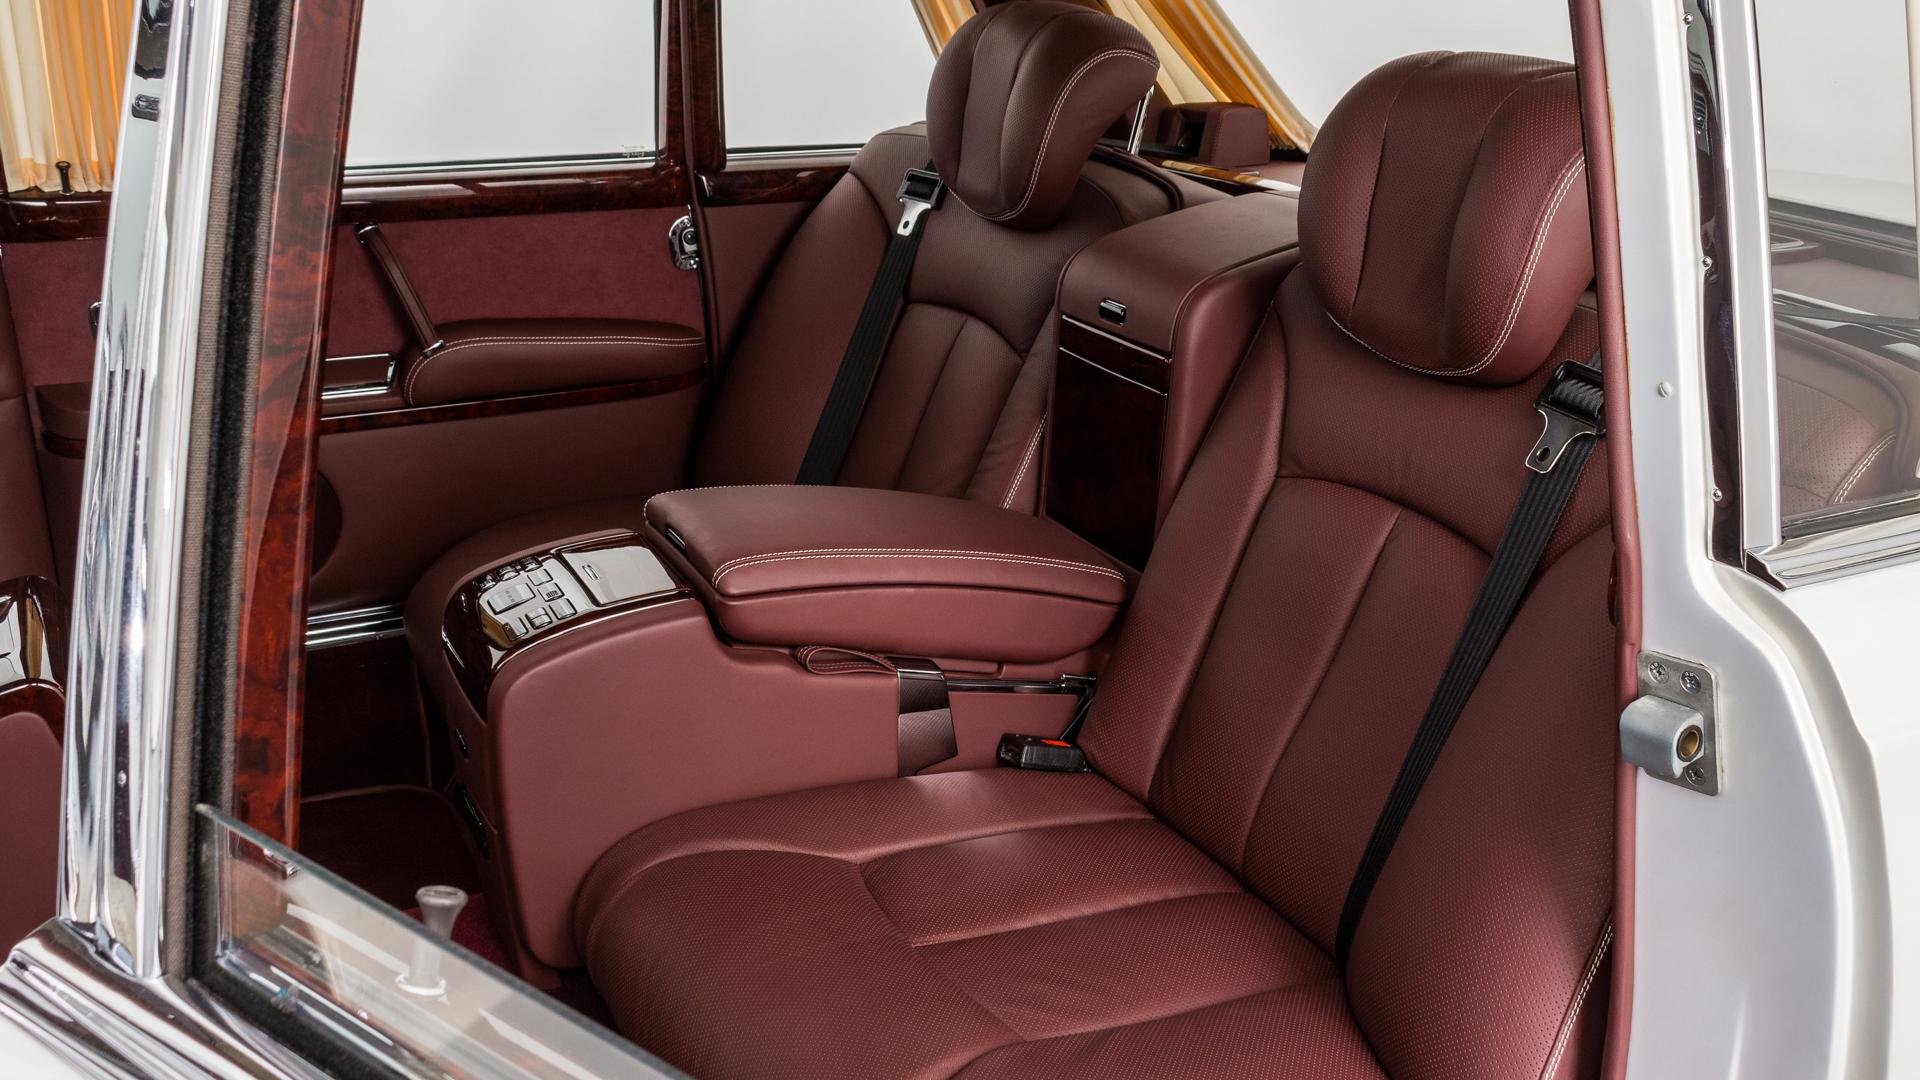 Mercedes-Benz W 100 600 Pullman Einzelstück sucht Käufer